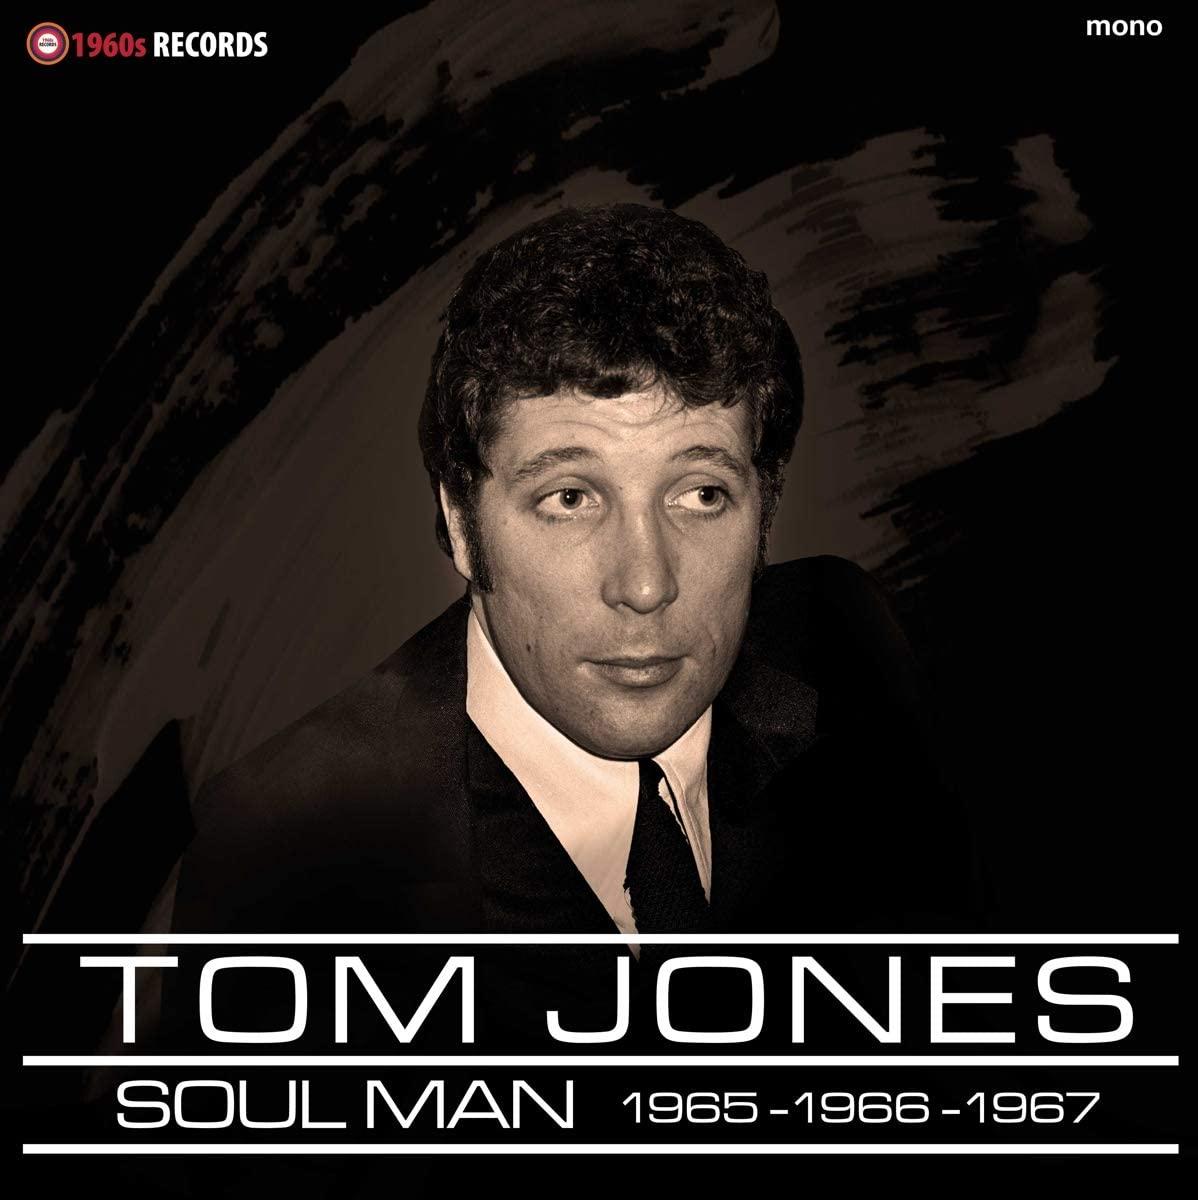 Tom Jones - Soul Man BBC Sessions 1965-1967